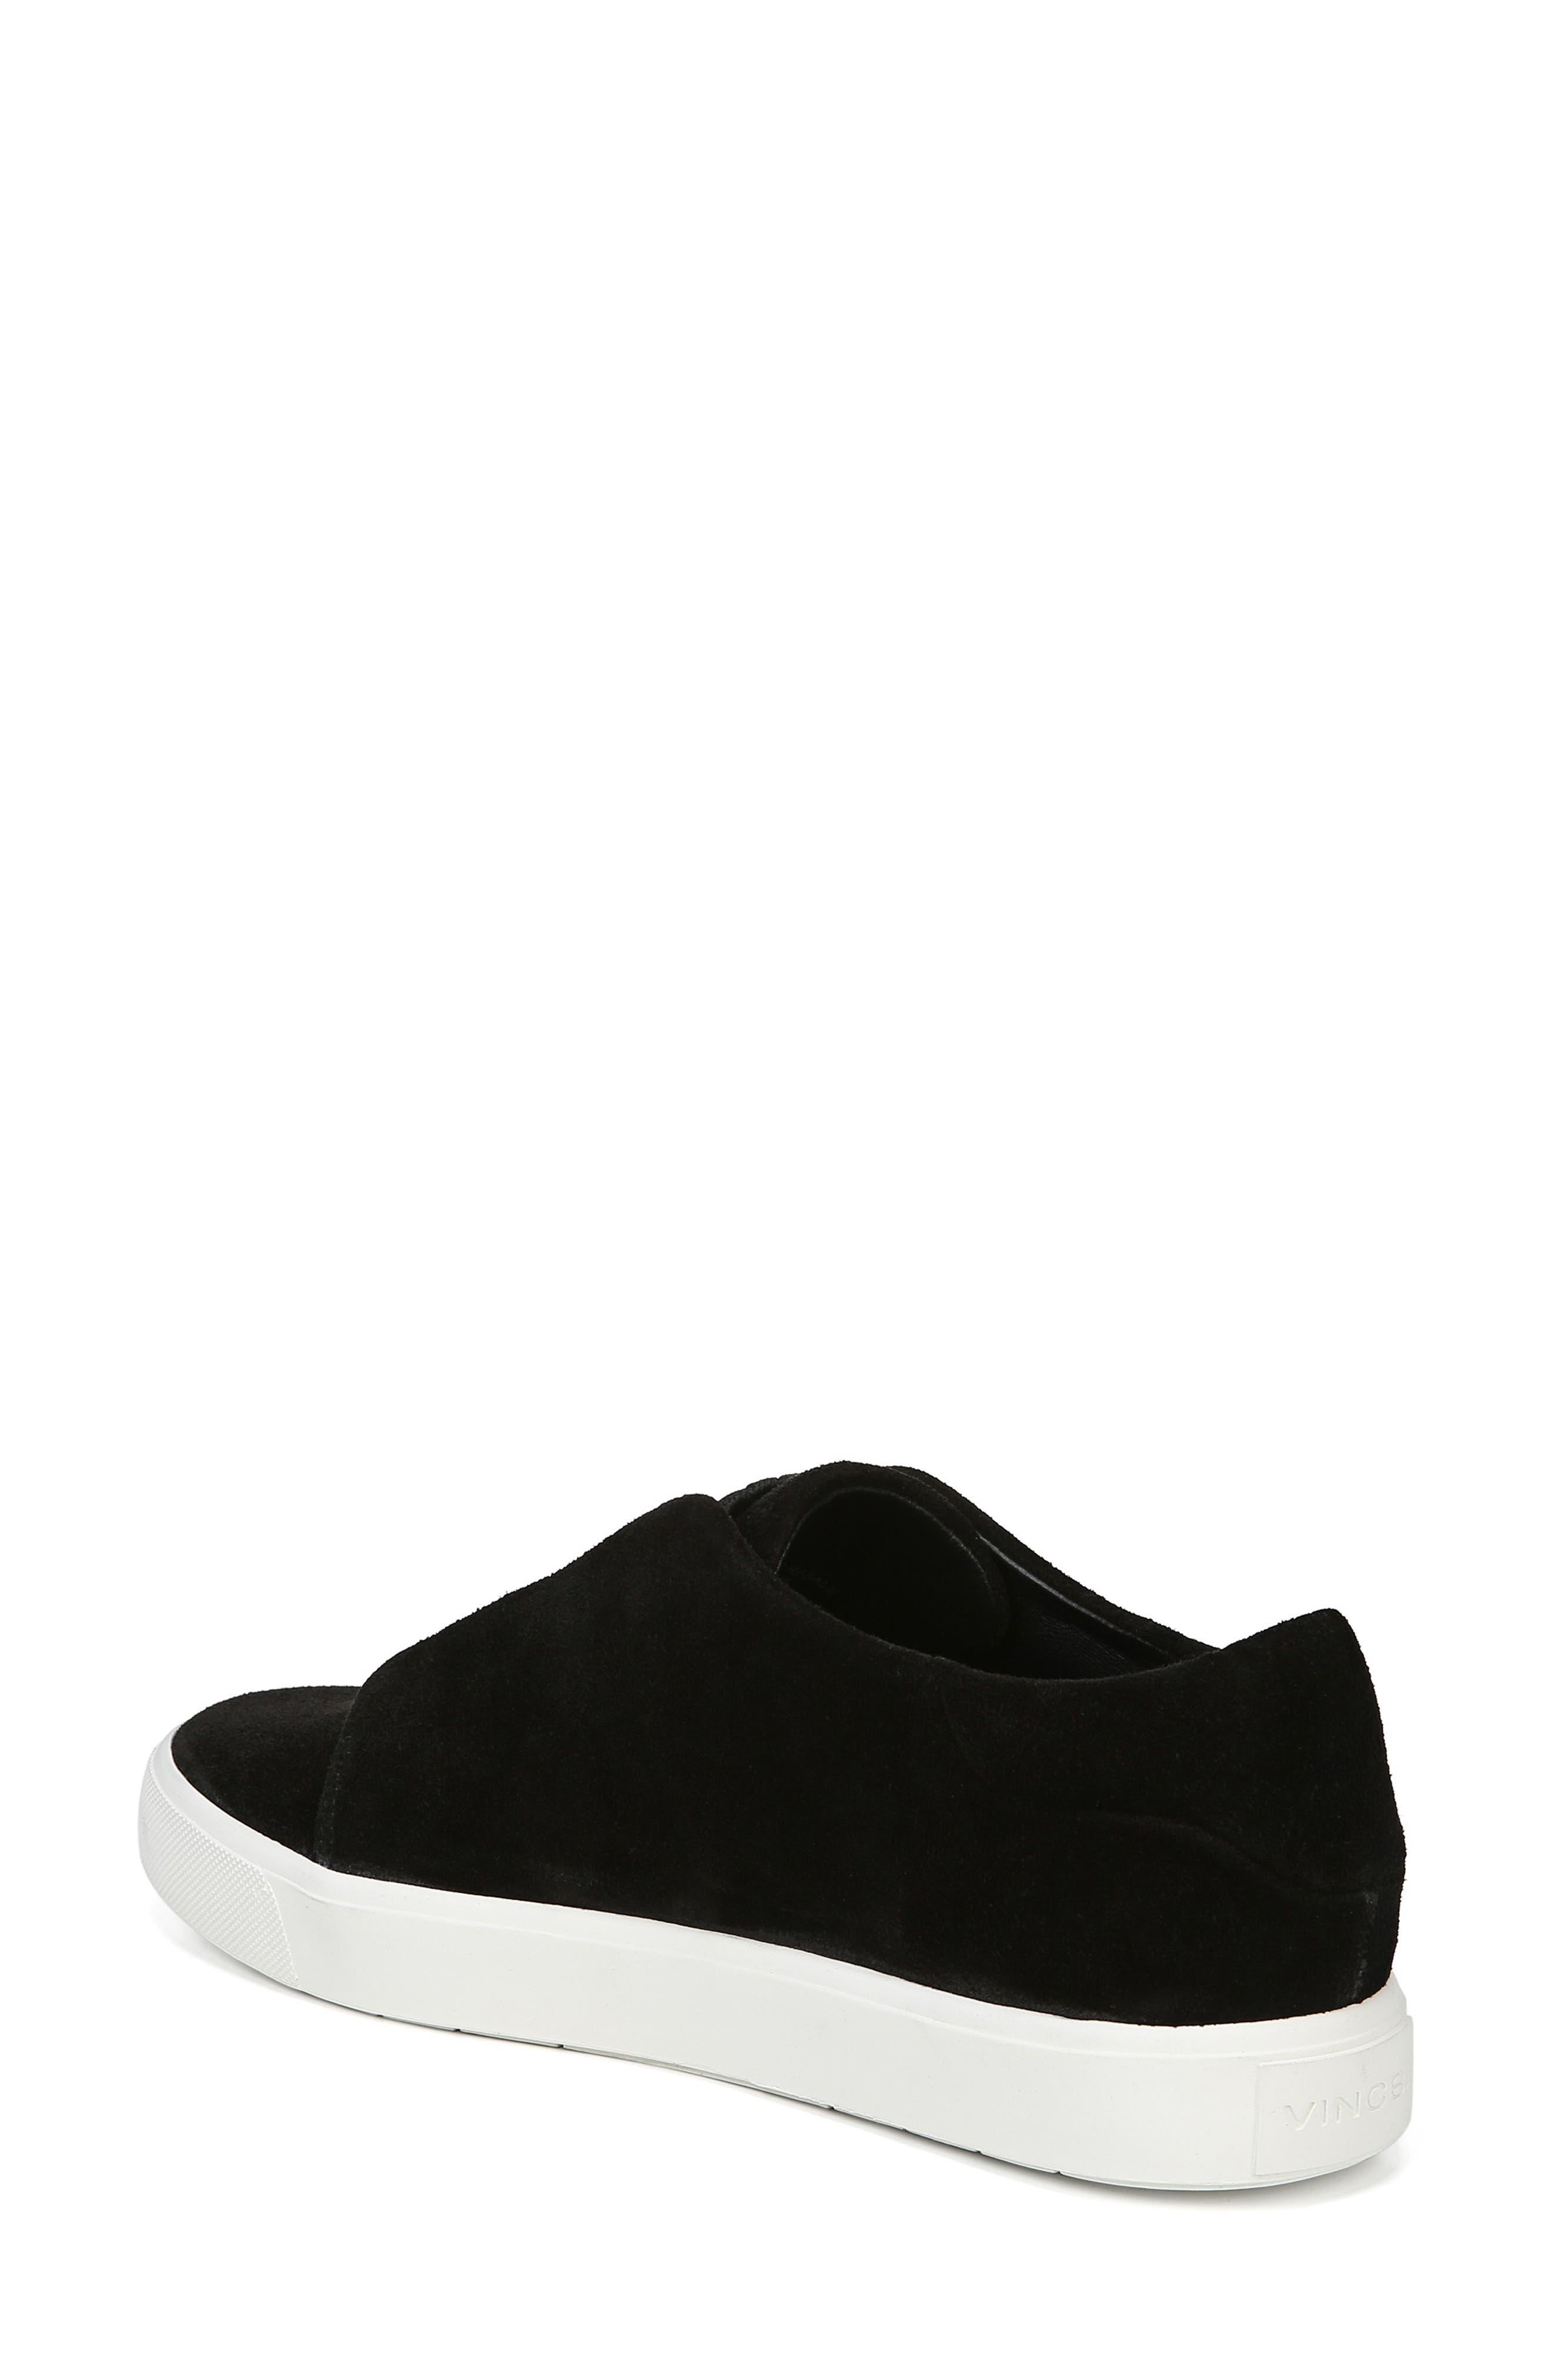 Cantara Slip-On Sneaker,                             Alternate thumbnail 2, color,                             BLACK SUEDE